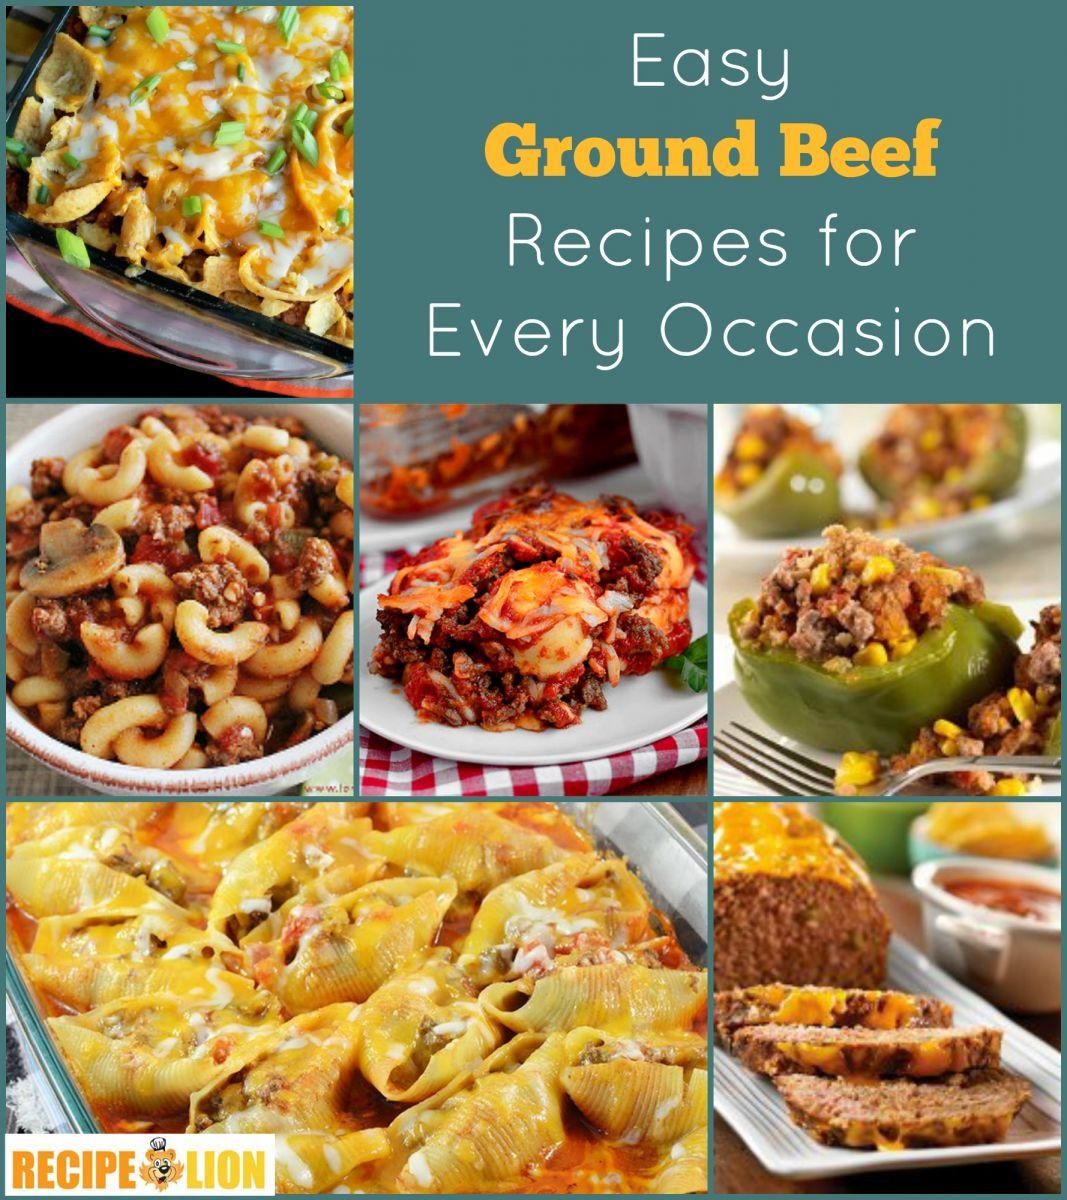 Easy Ground Beef Recipes  133 Easy Ground Beef Recipes